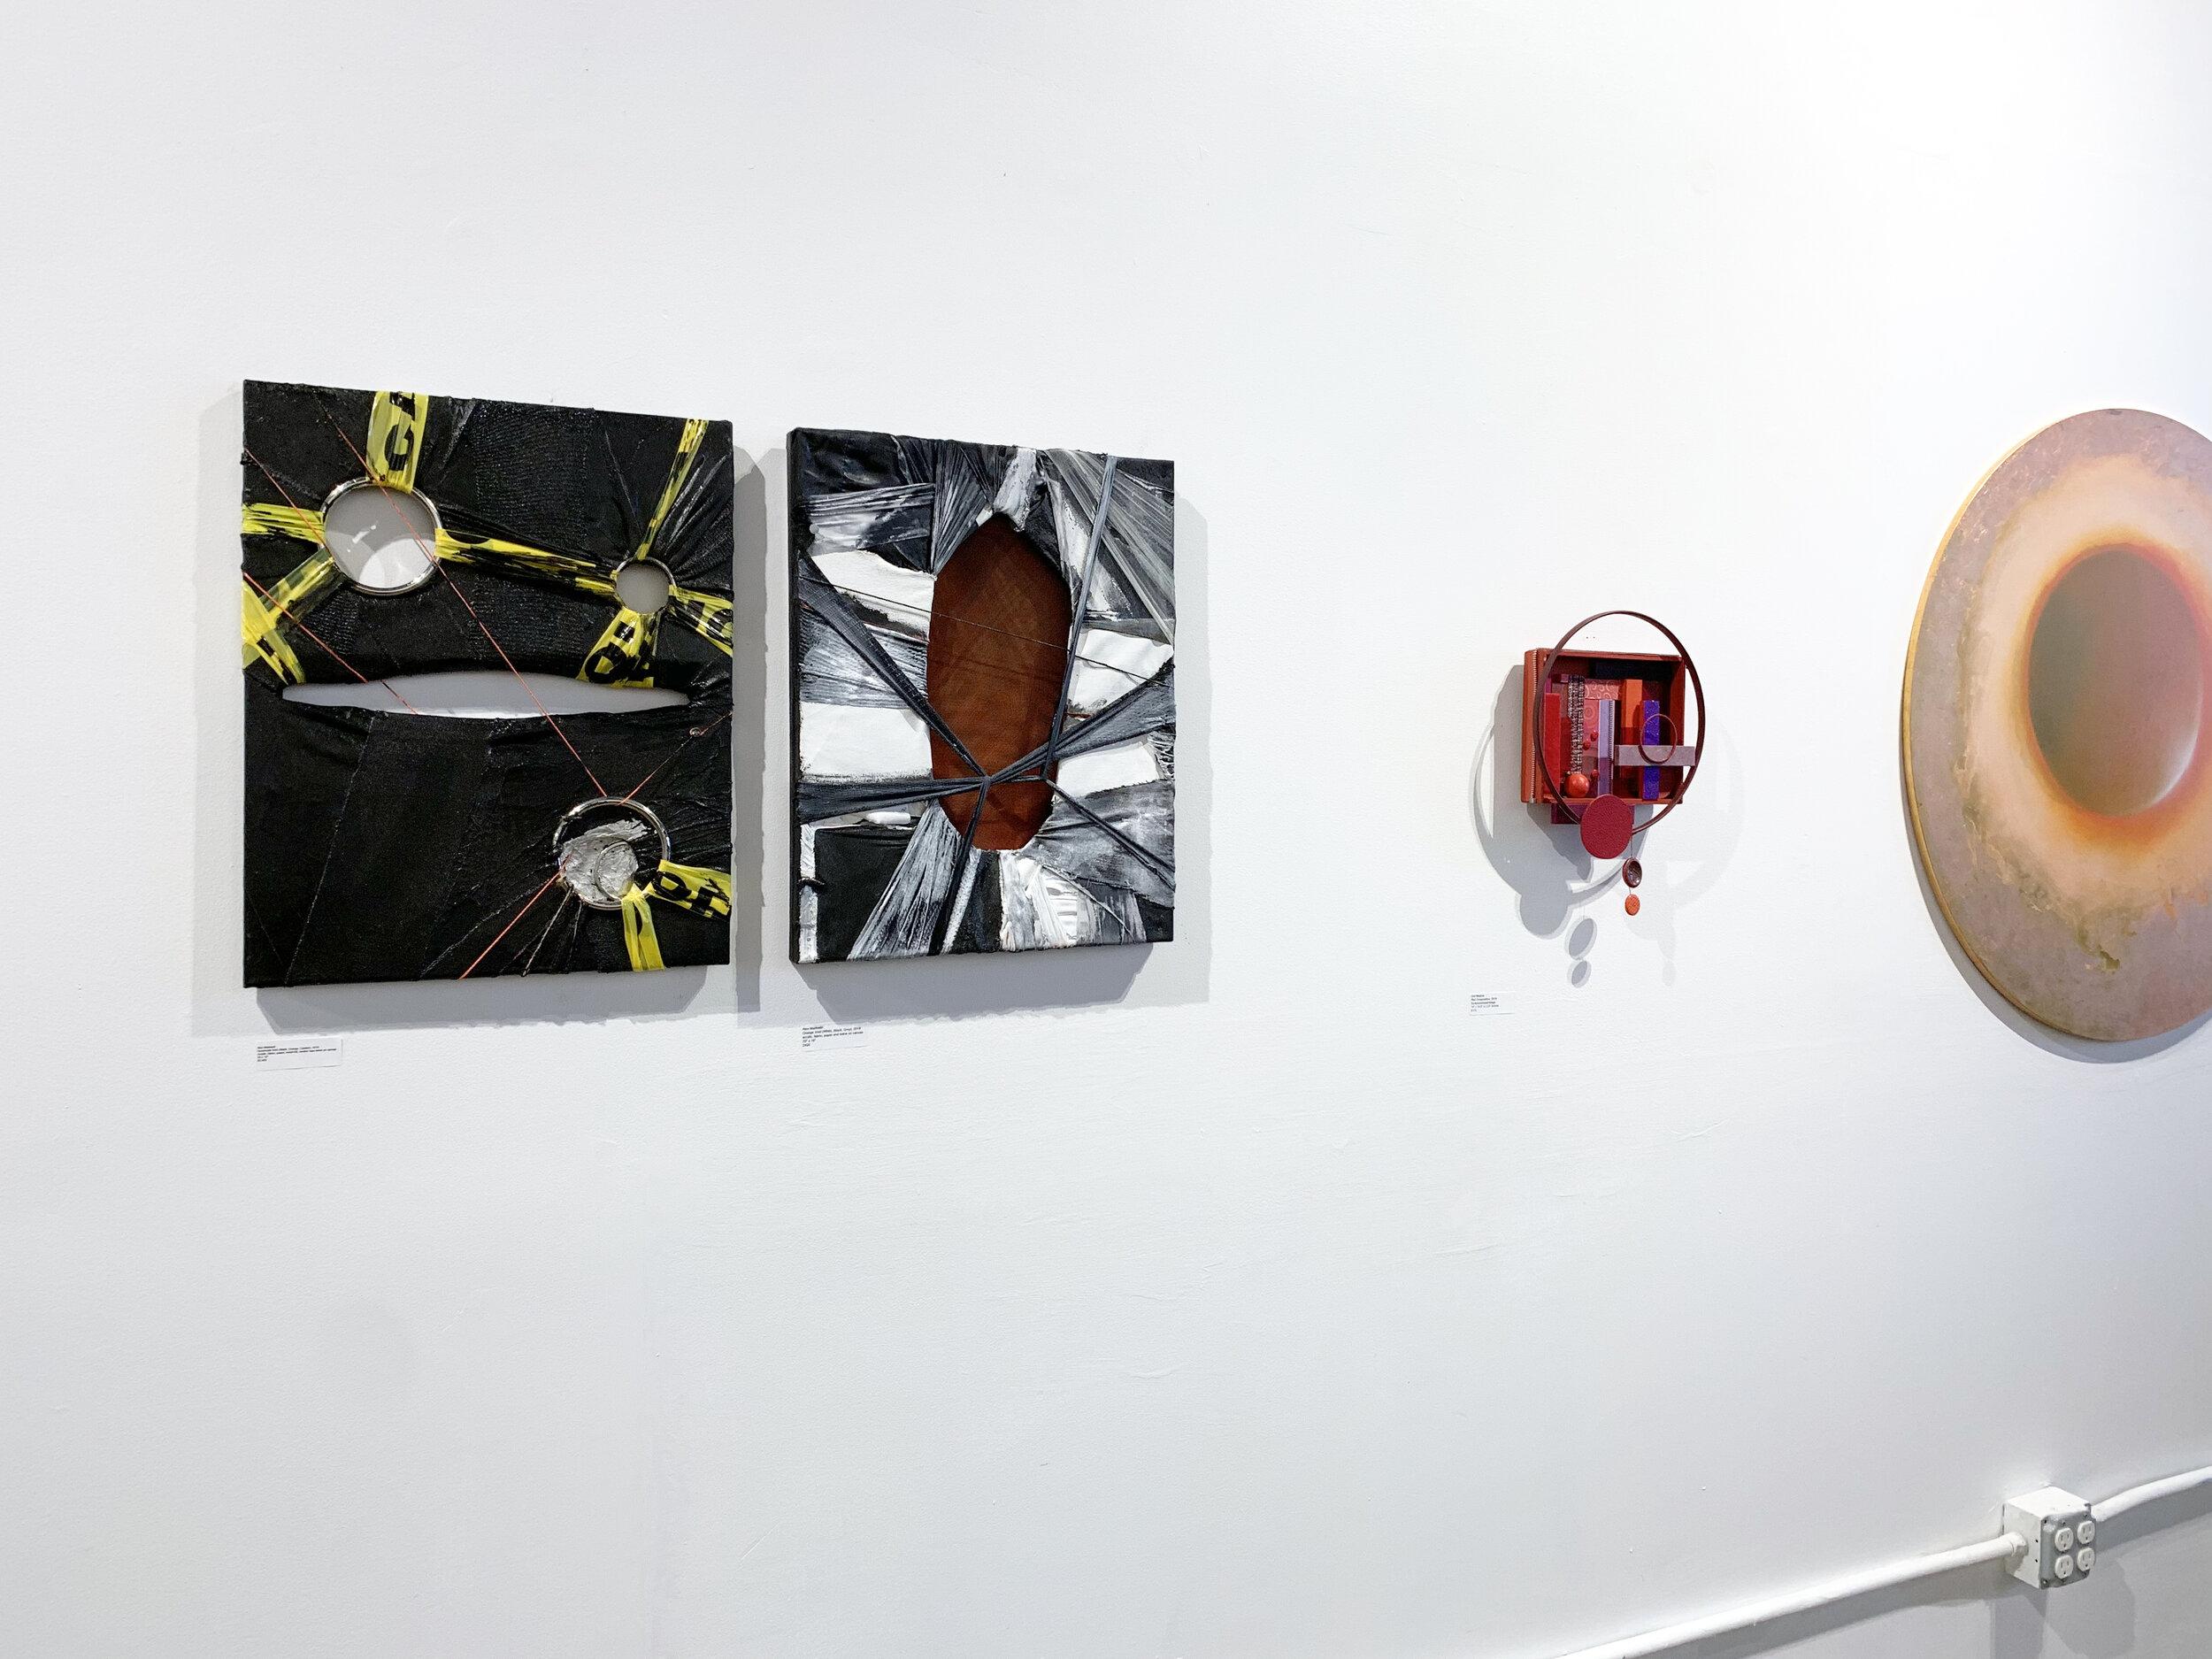 Alex-Markwith-Plaxall-Gallery-installation-wall-September-2019